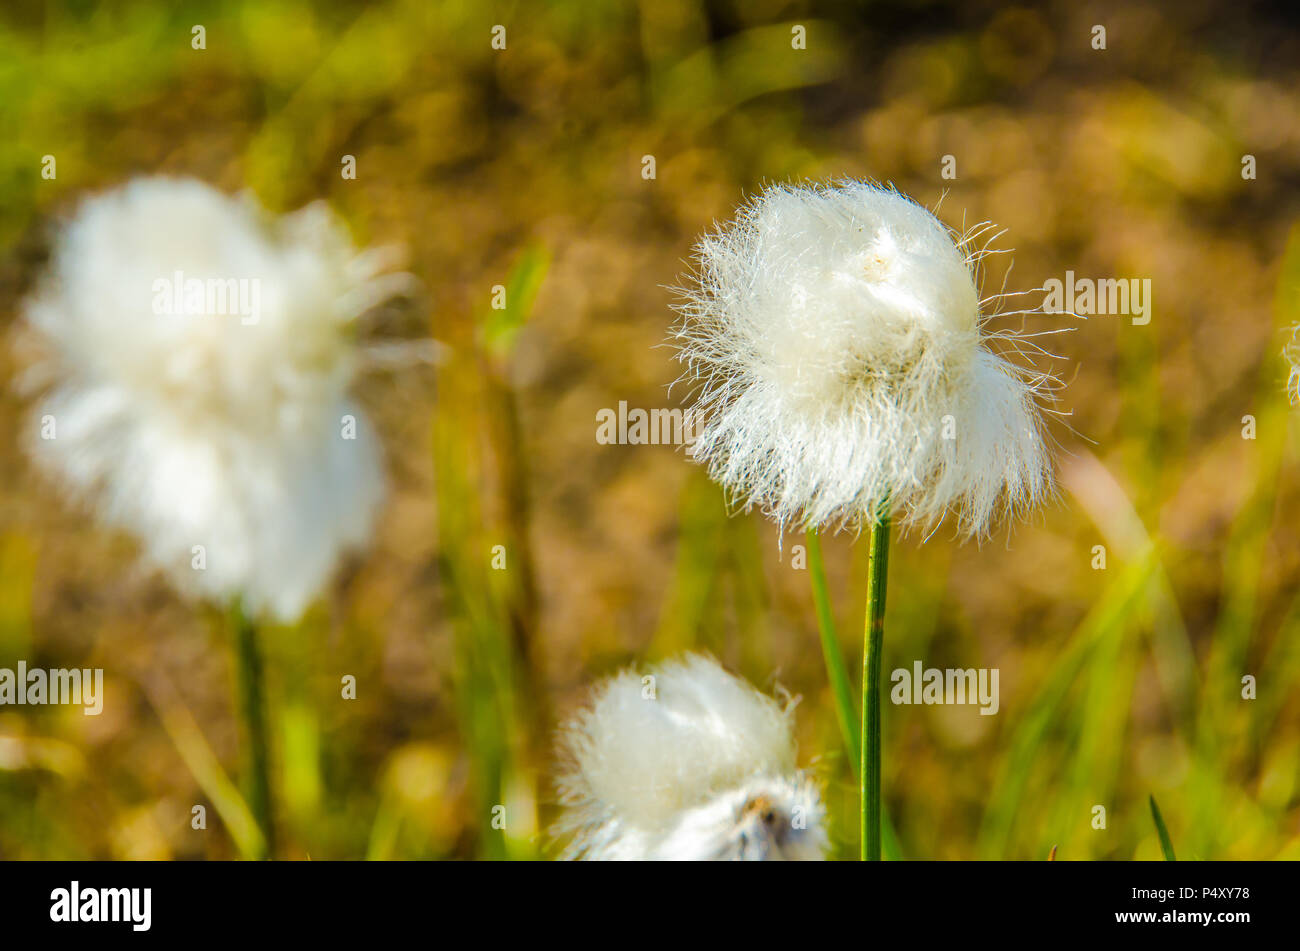 Landmannalaugar - Amazing flower field in the Highland of Iceland - Stock Image